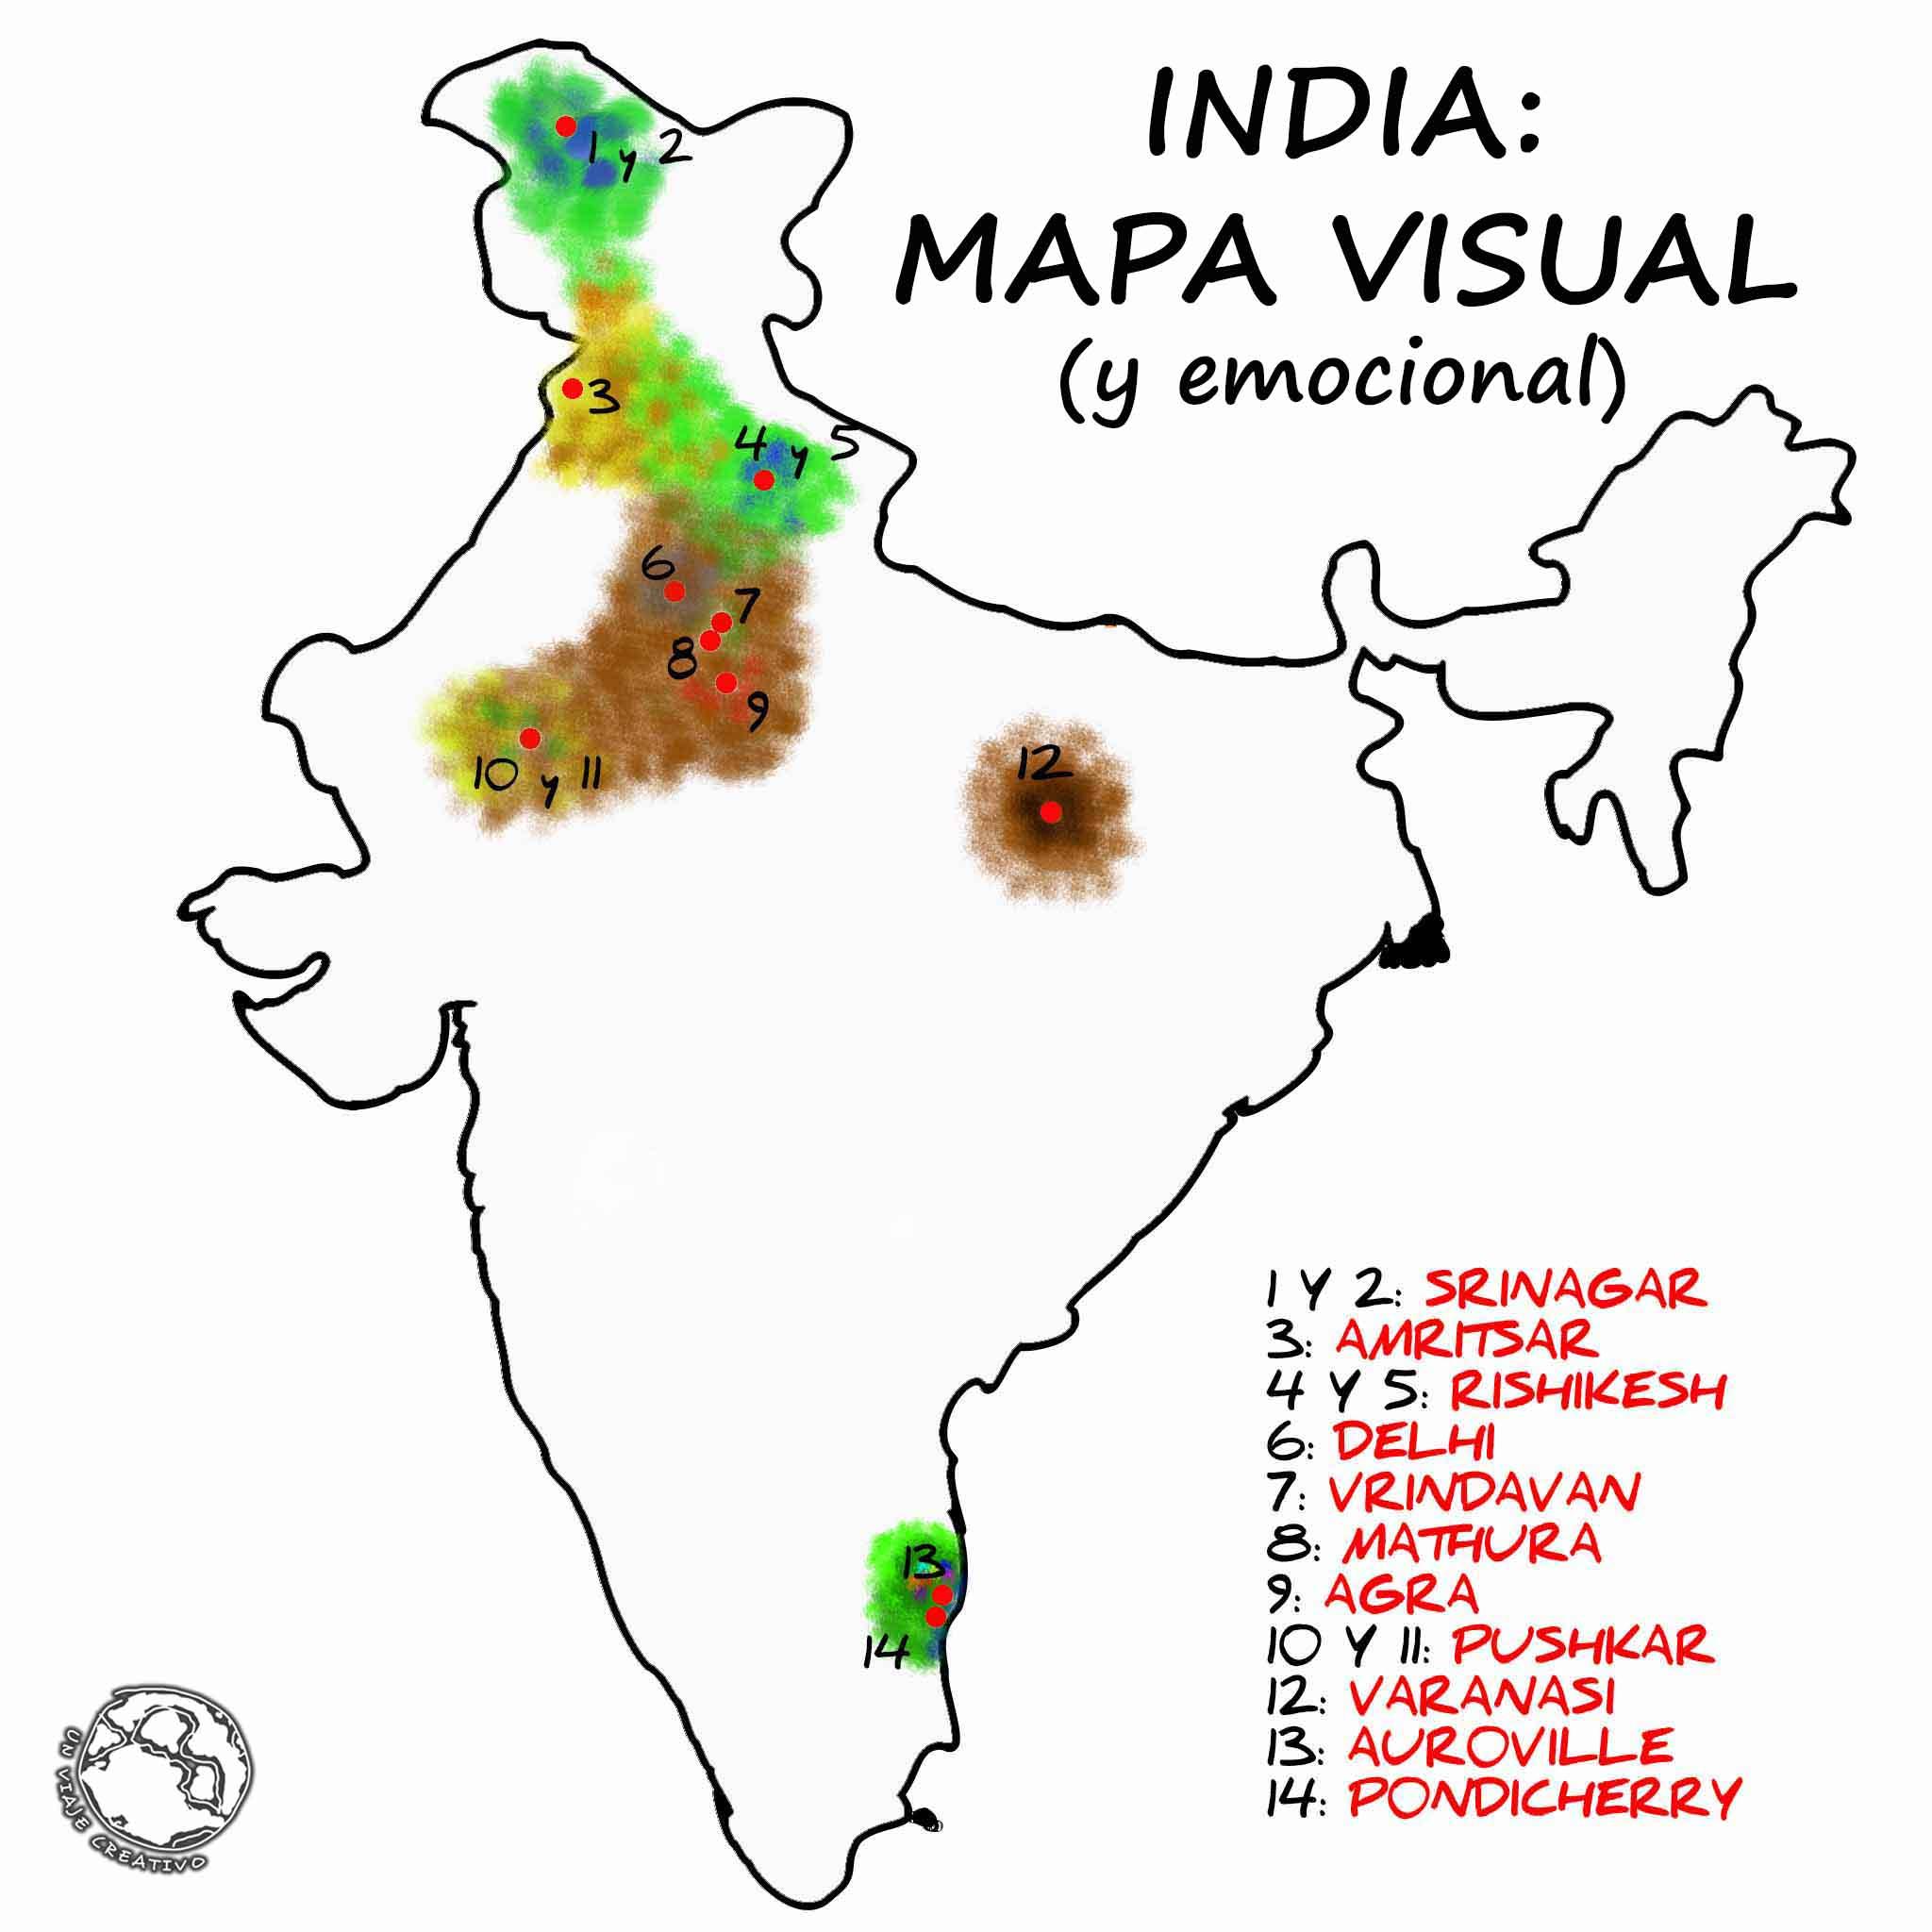 INDIA - MAPA VISUAL